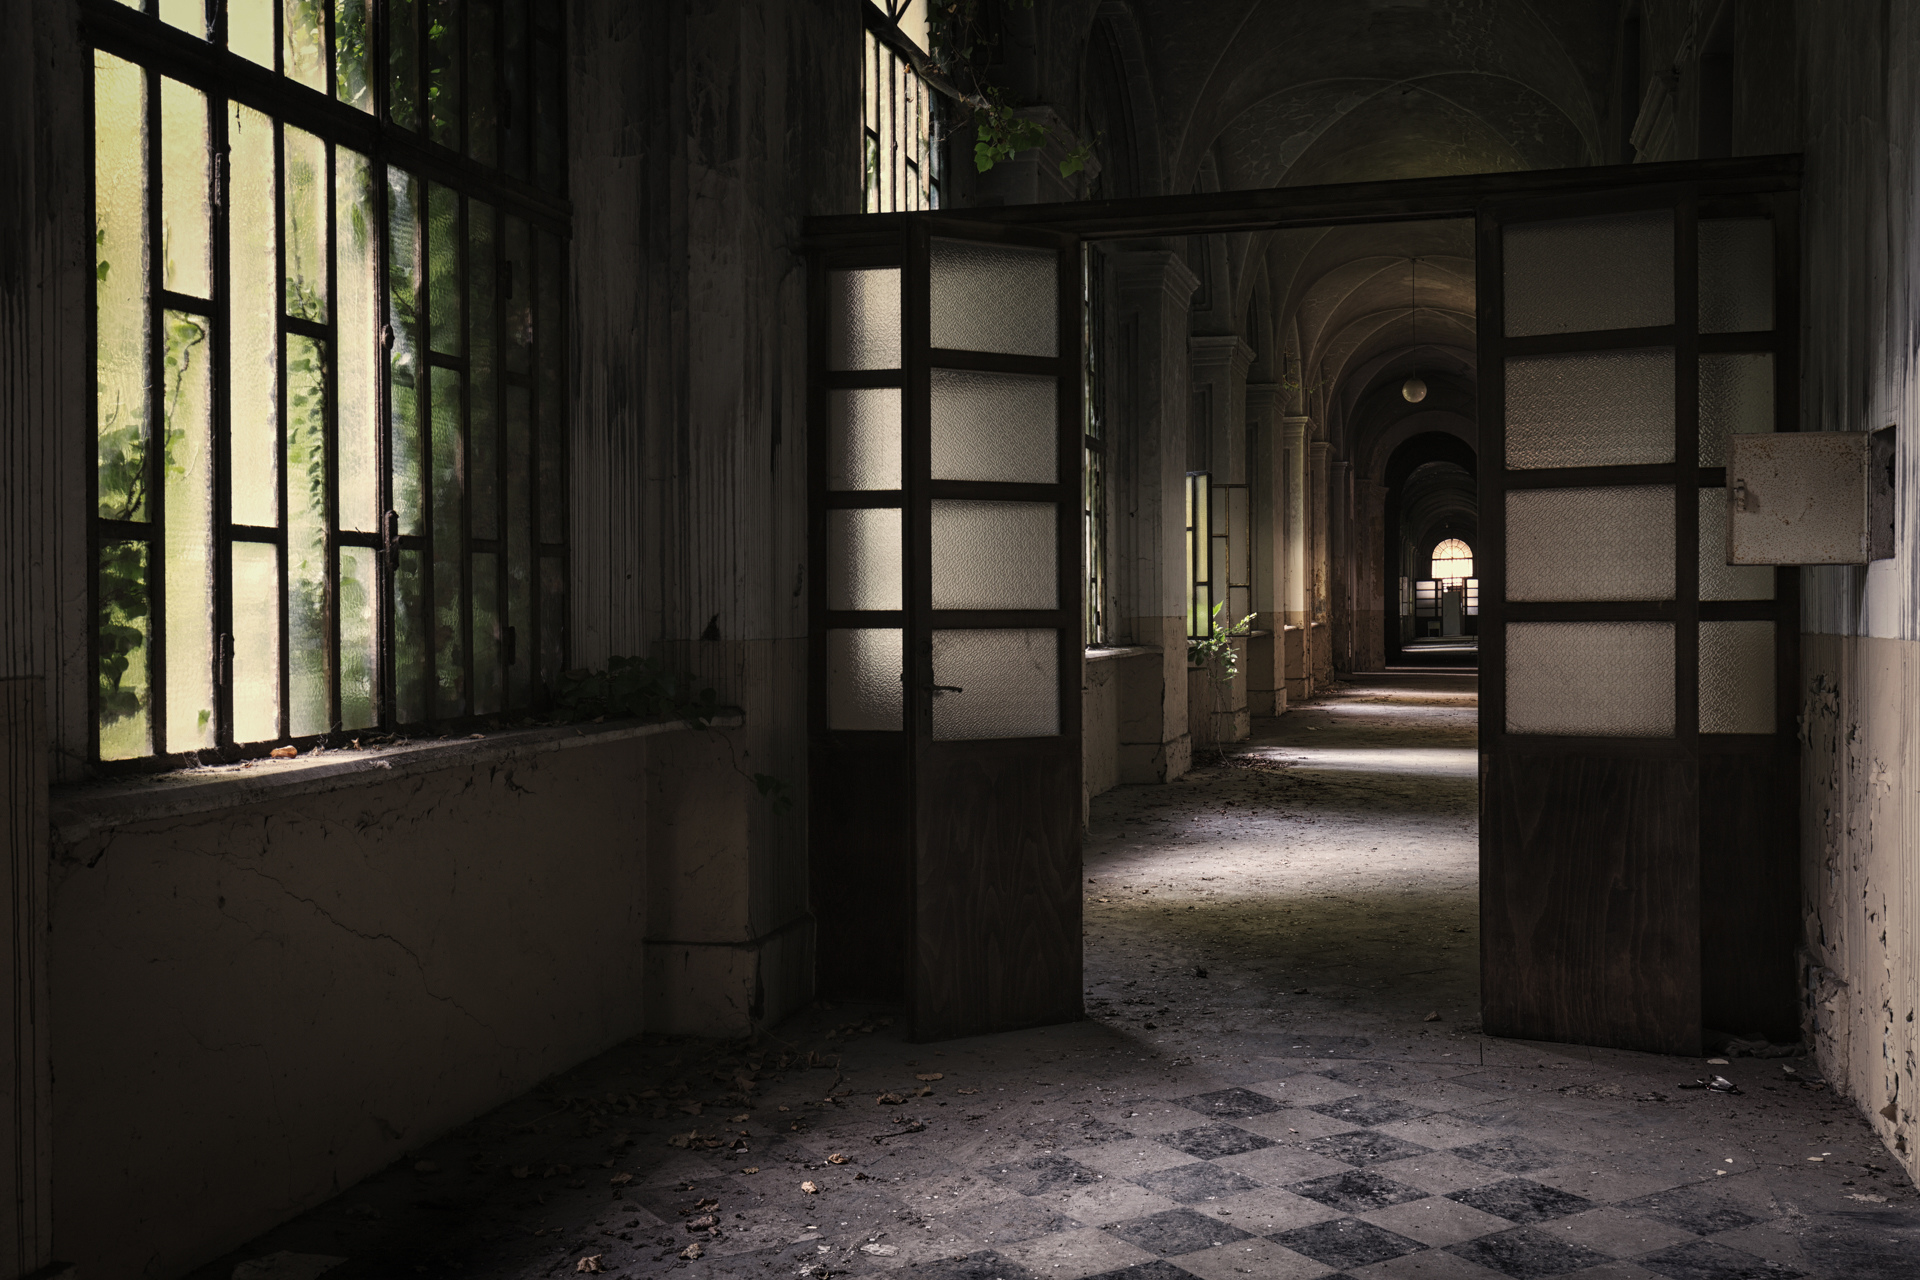 Urban Exploration - Manicomio Dr. Rossetti - Empty Corridor